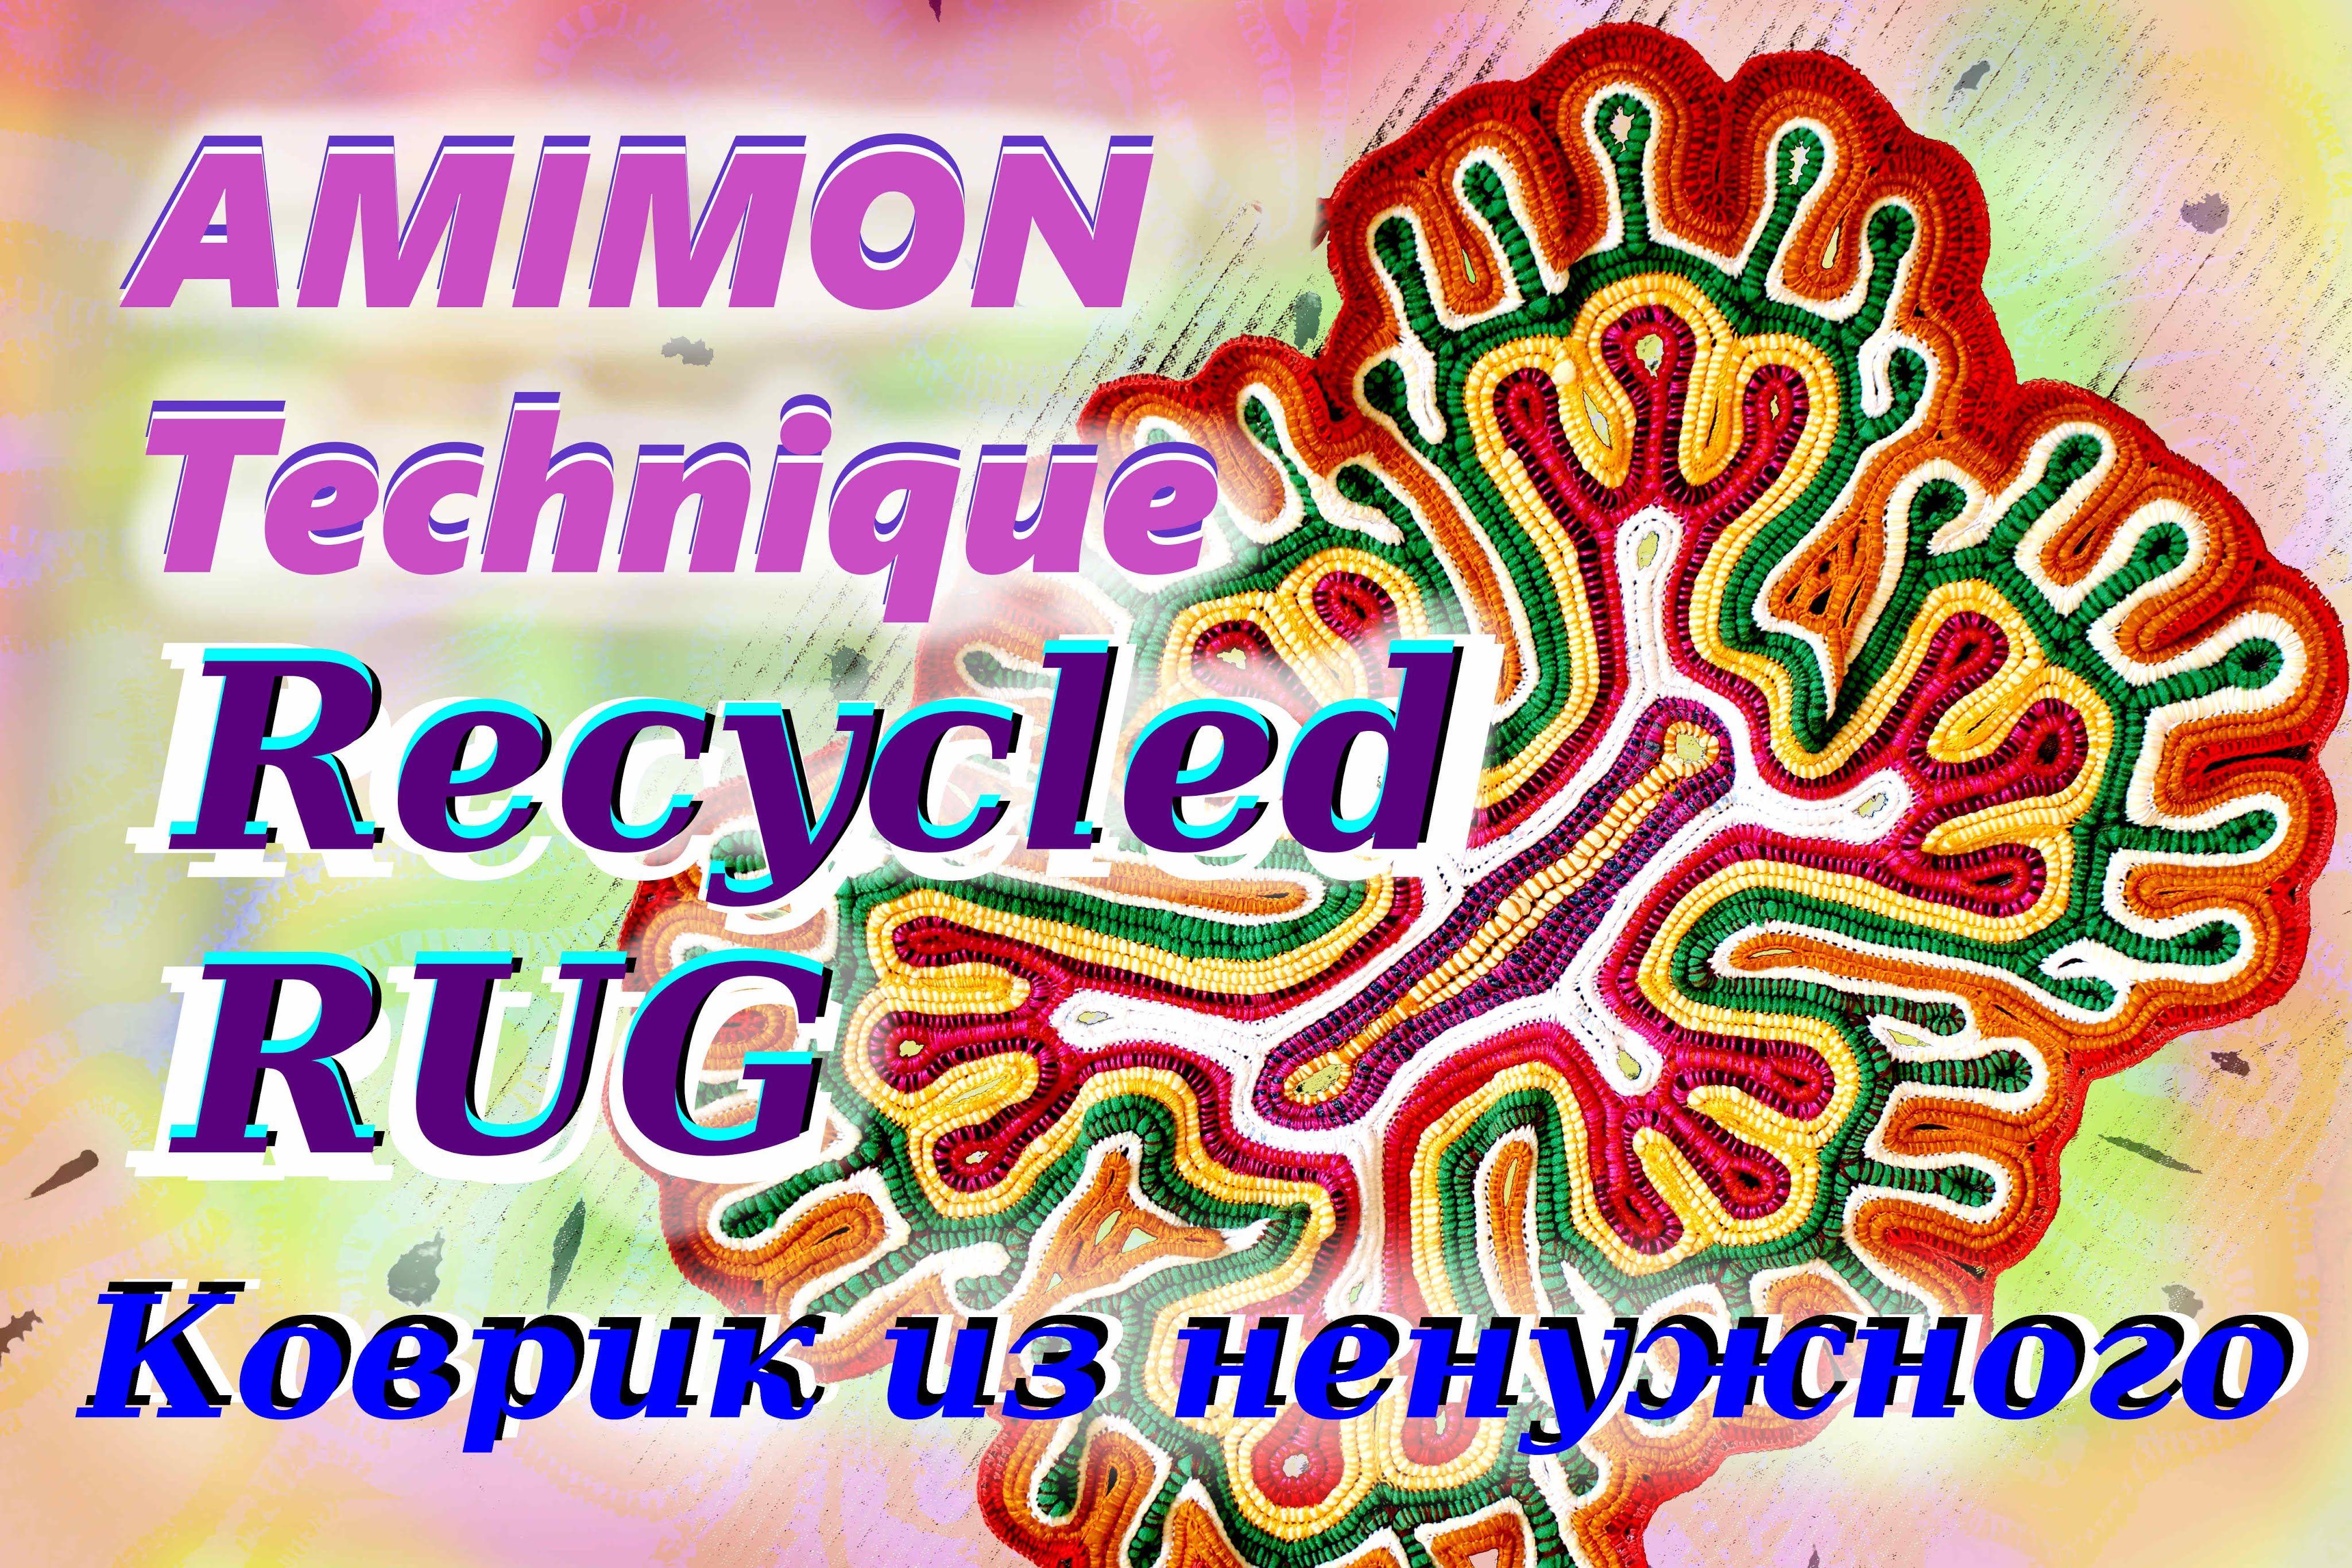 Amimon Technique rug from recycled  Вяжем красивый коврик из ненужной од...